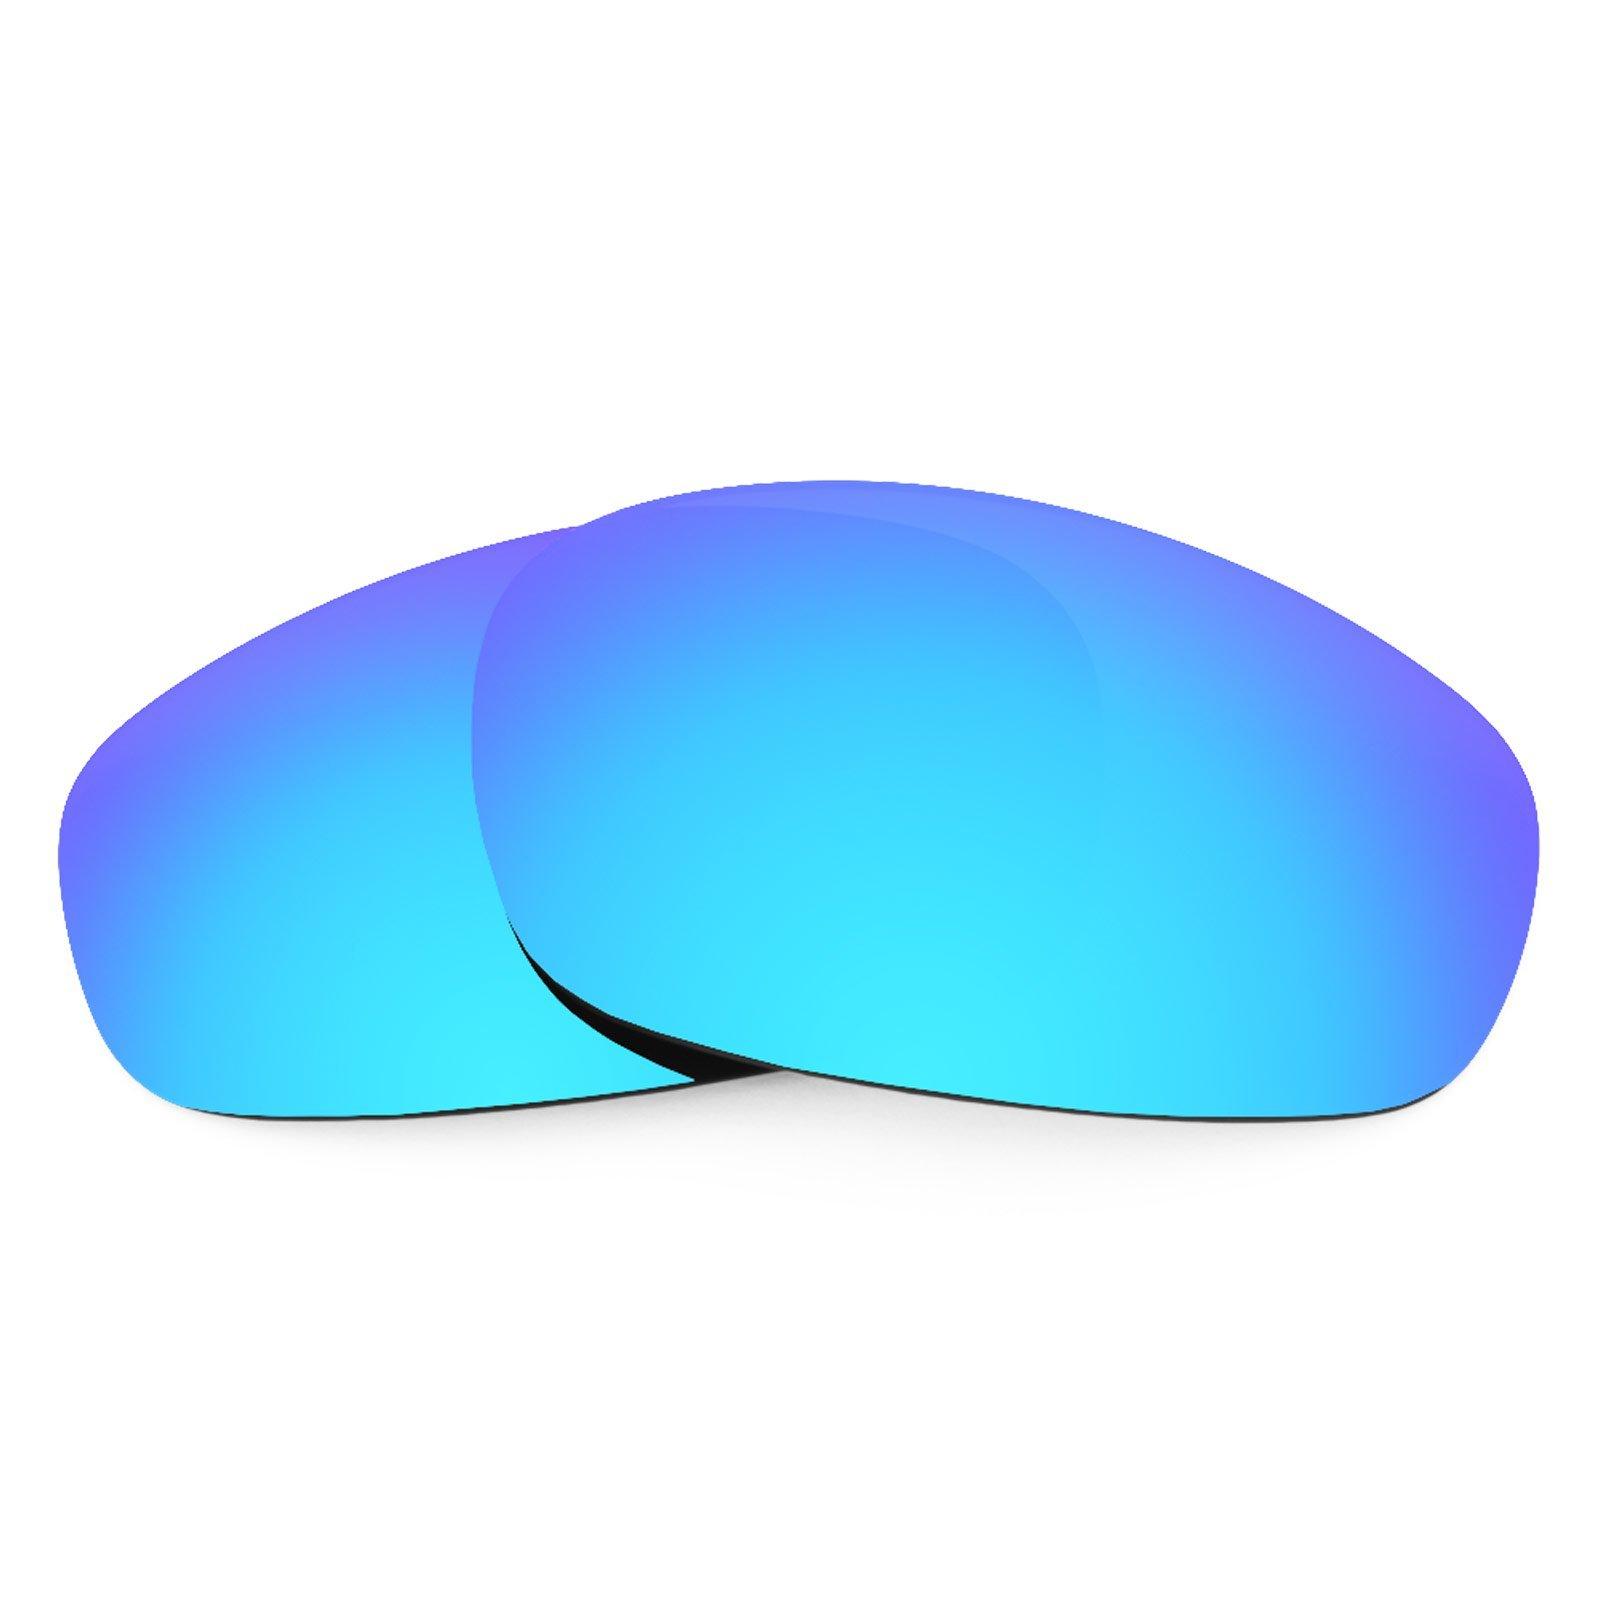 Revant Polarized Replacement Lenses for Oakley Split Jacket Ice Blue MirrorShield